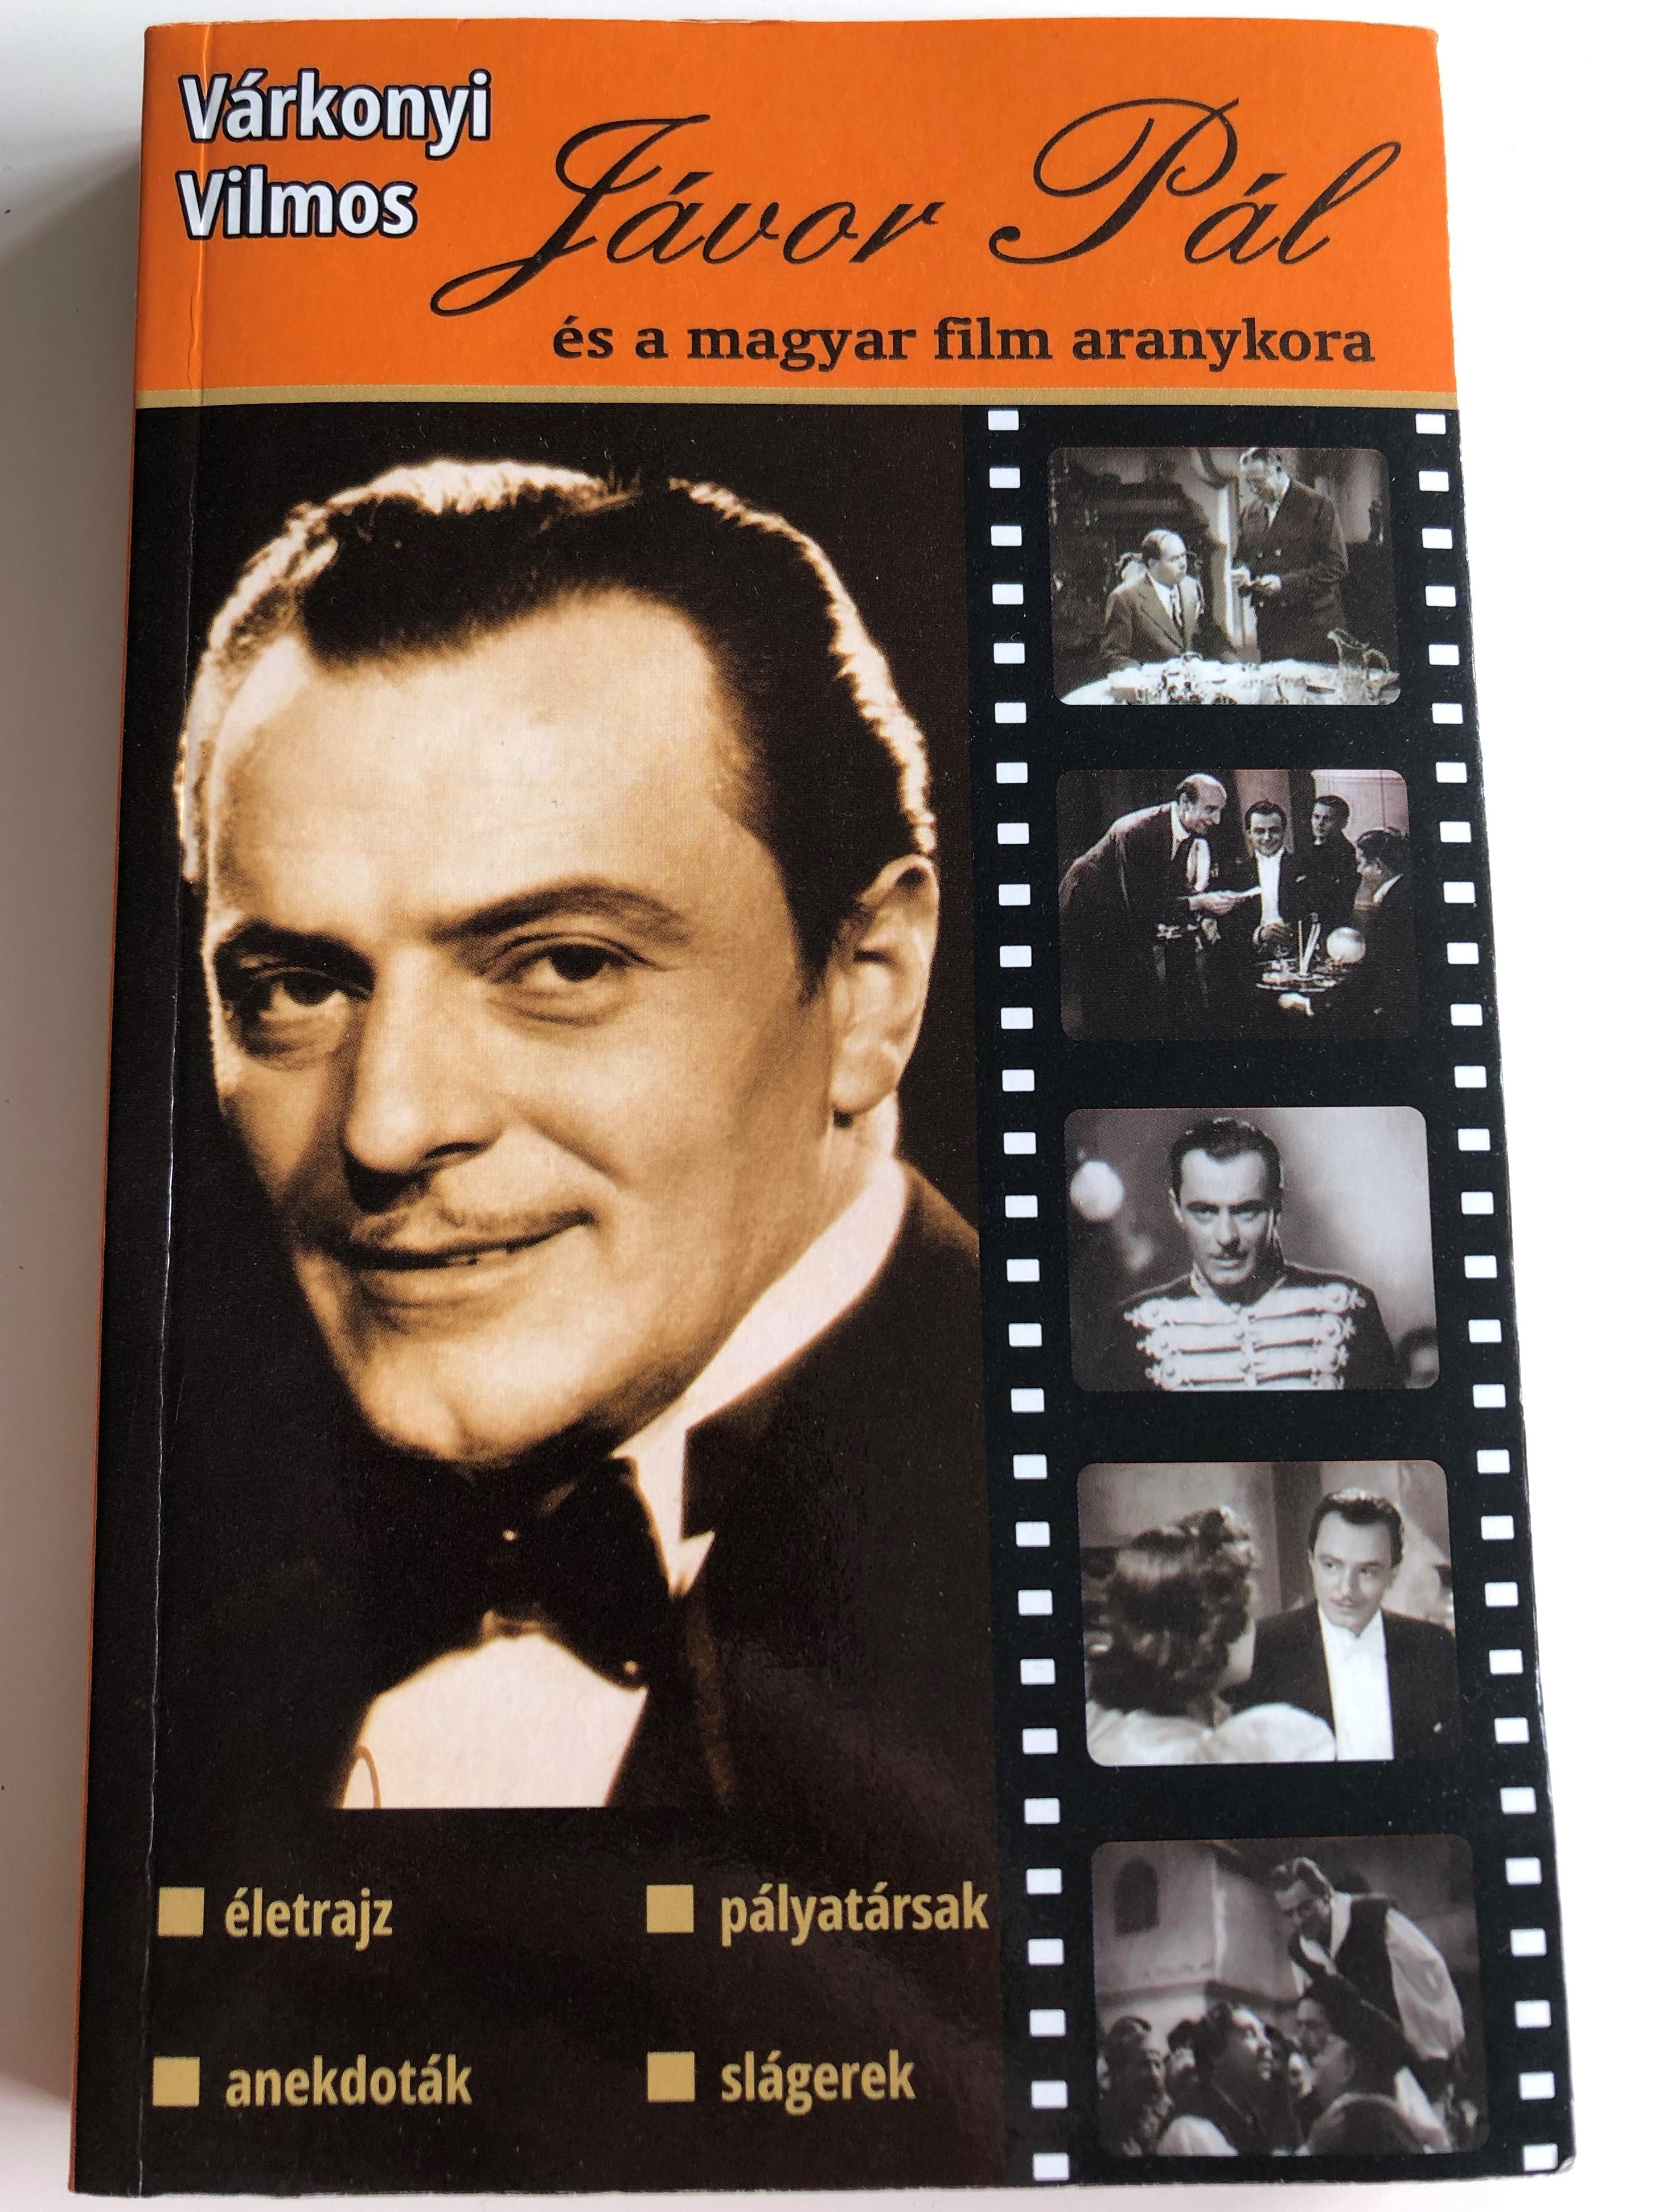 j-vor-p-l-s-a-magyar-film-aranykora-by-v-rkonyi-vilmos-letrajz-anekdot-k-p-lyat-rsak-sl-gerek-1.jpg